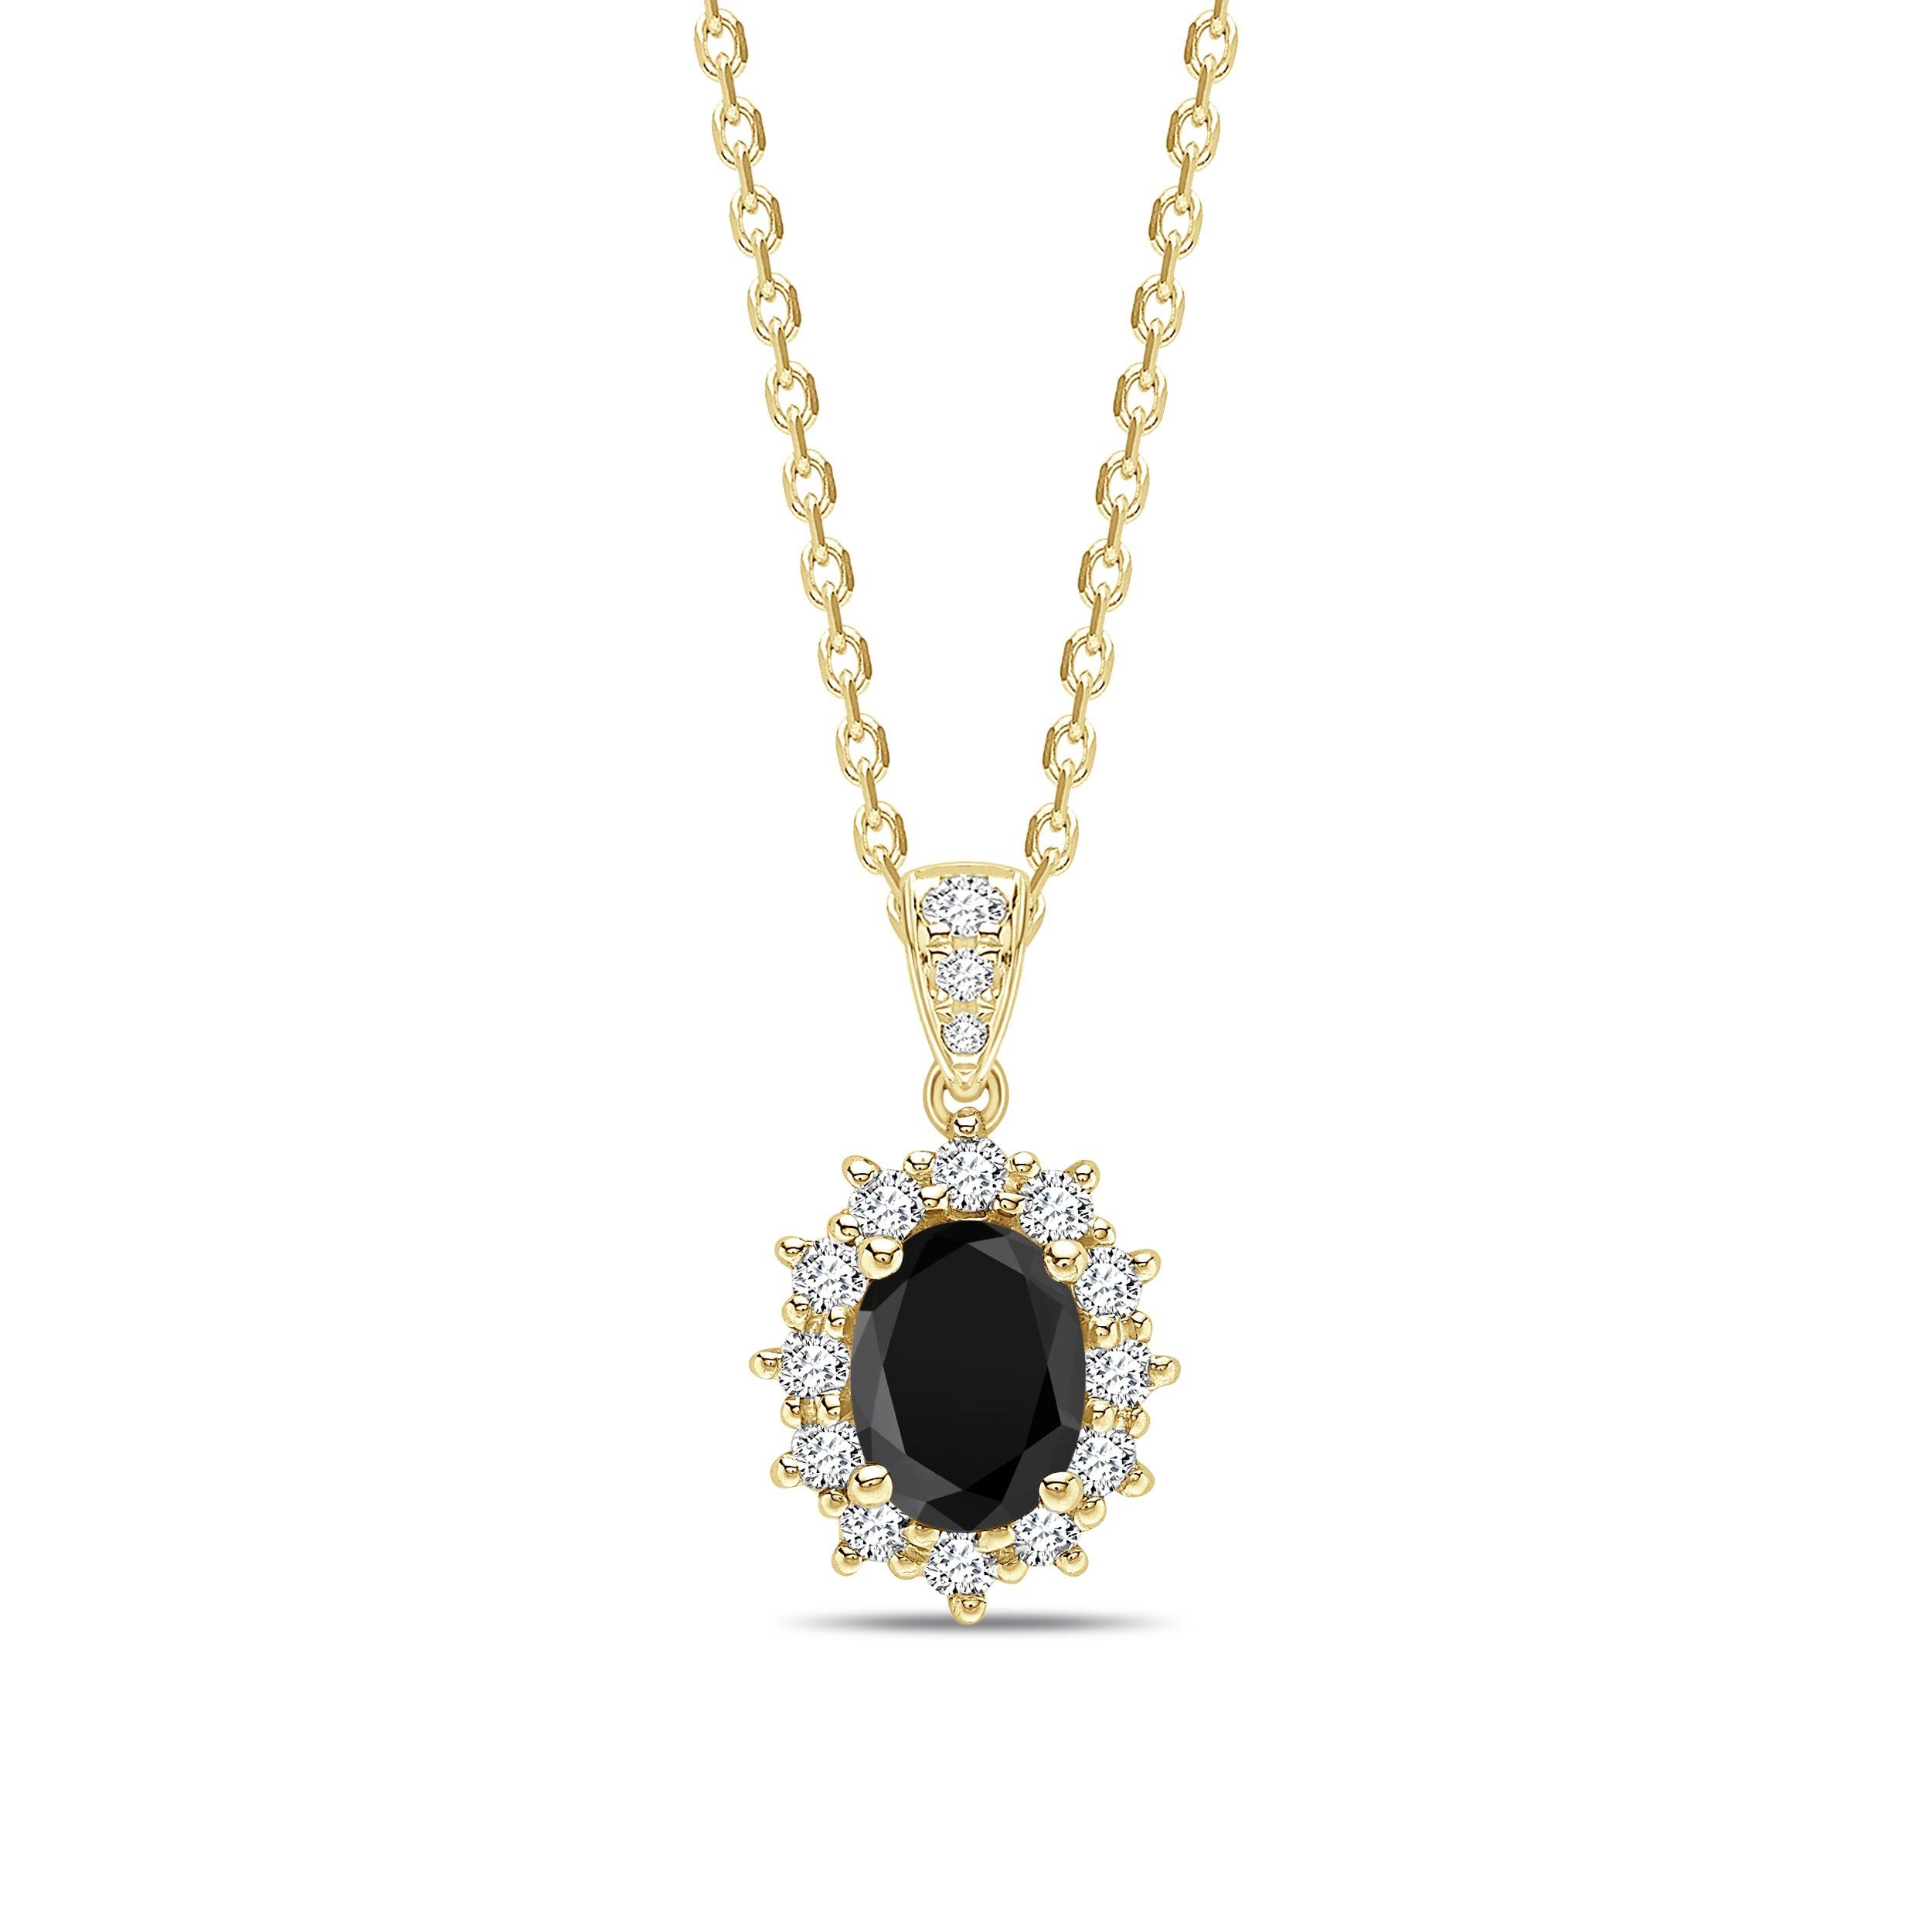 Dangling Halo Style Black Diamond Solitaire Pendants Necklace